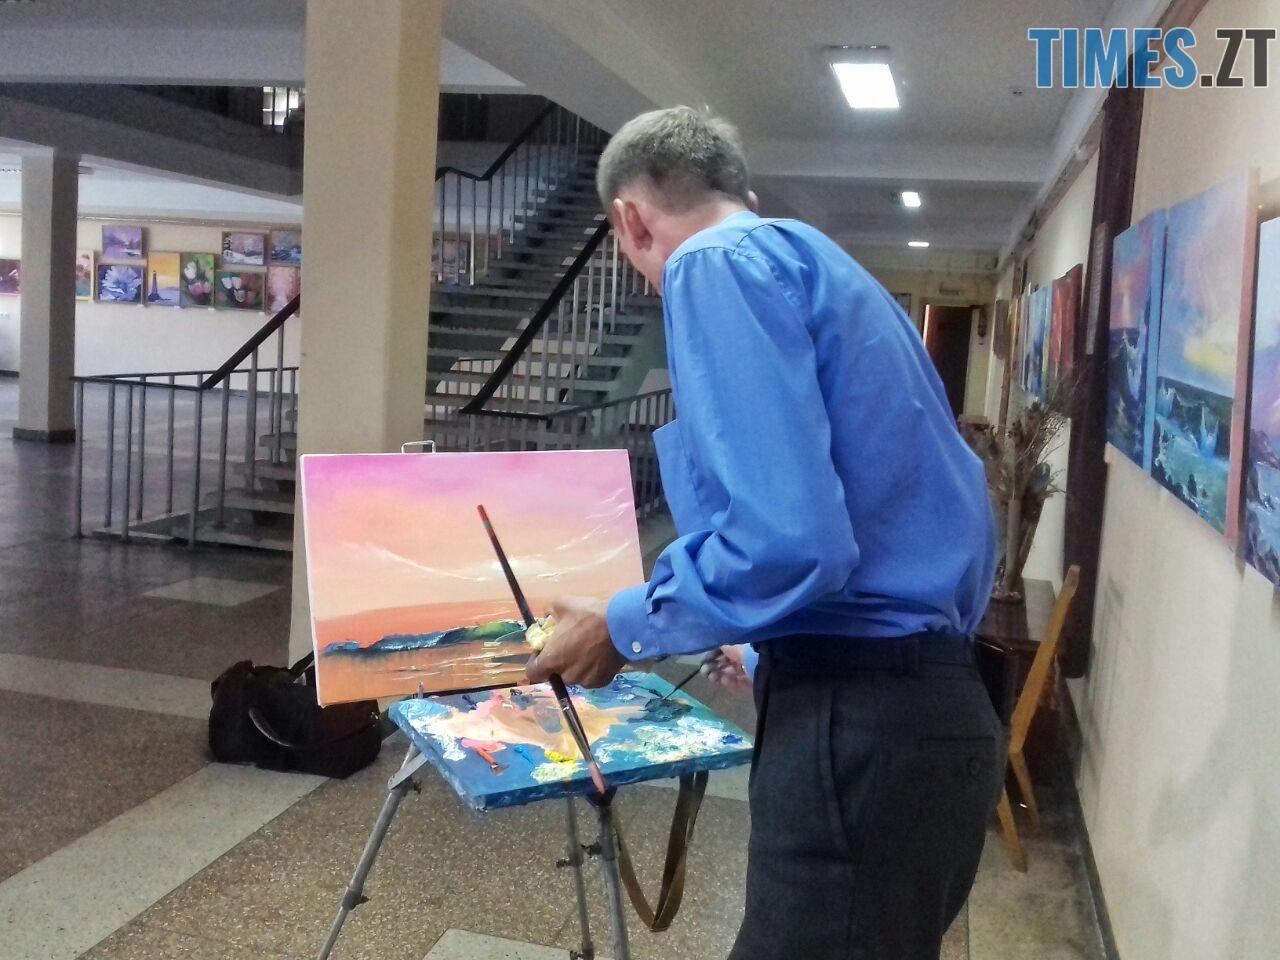 WhatsApp Image 2018 09 01 at 12.12.48 1 - Мистецтво нашвидкуруч: митець показав, як намалювати картину за 20 хвилин (ФОТО)